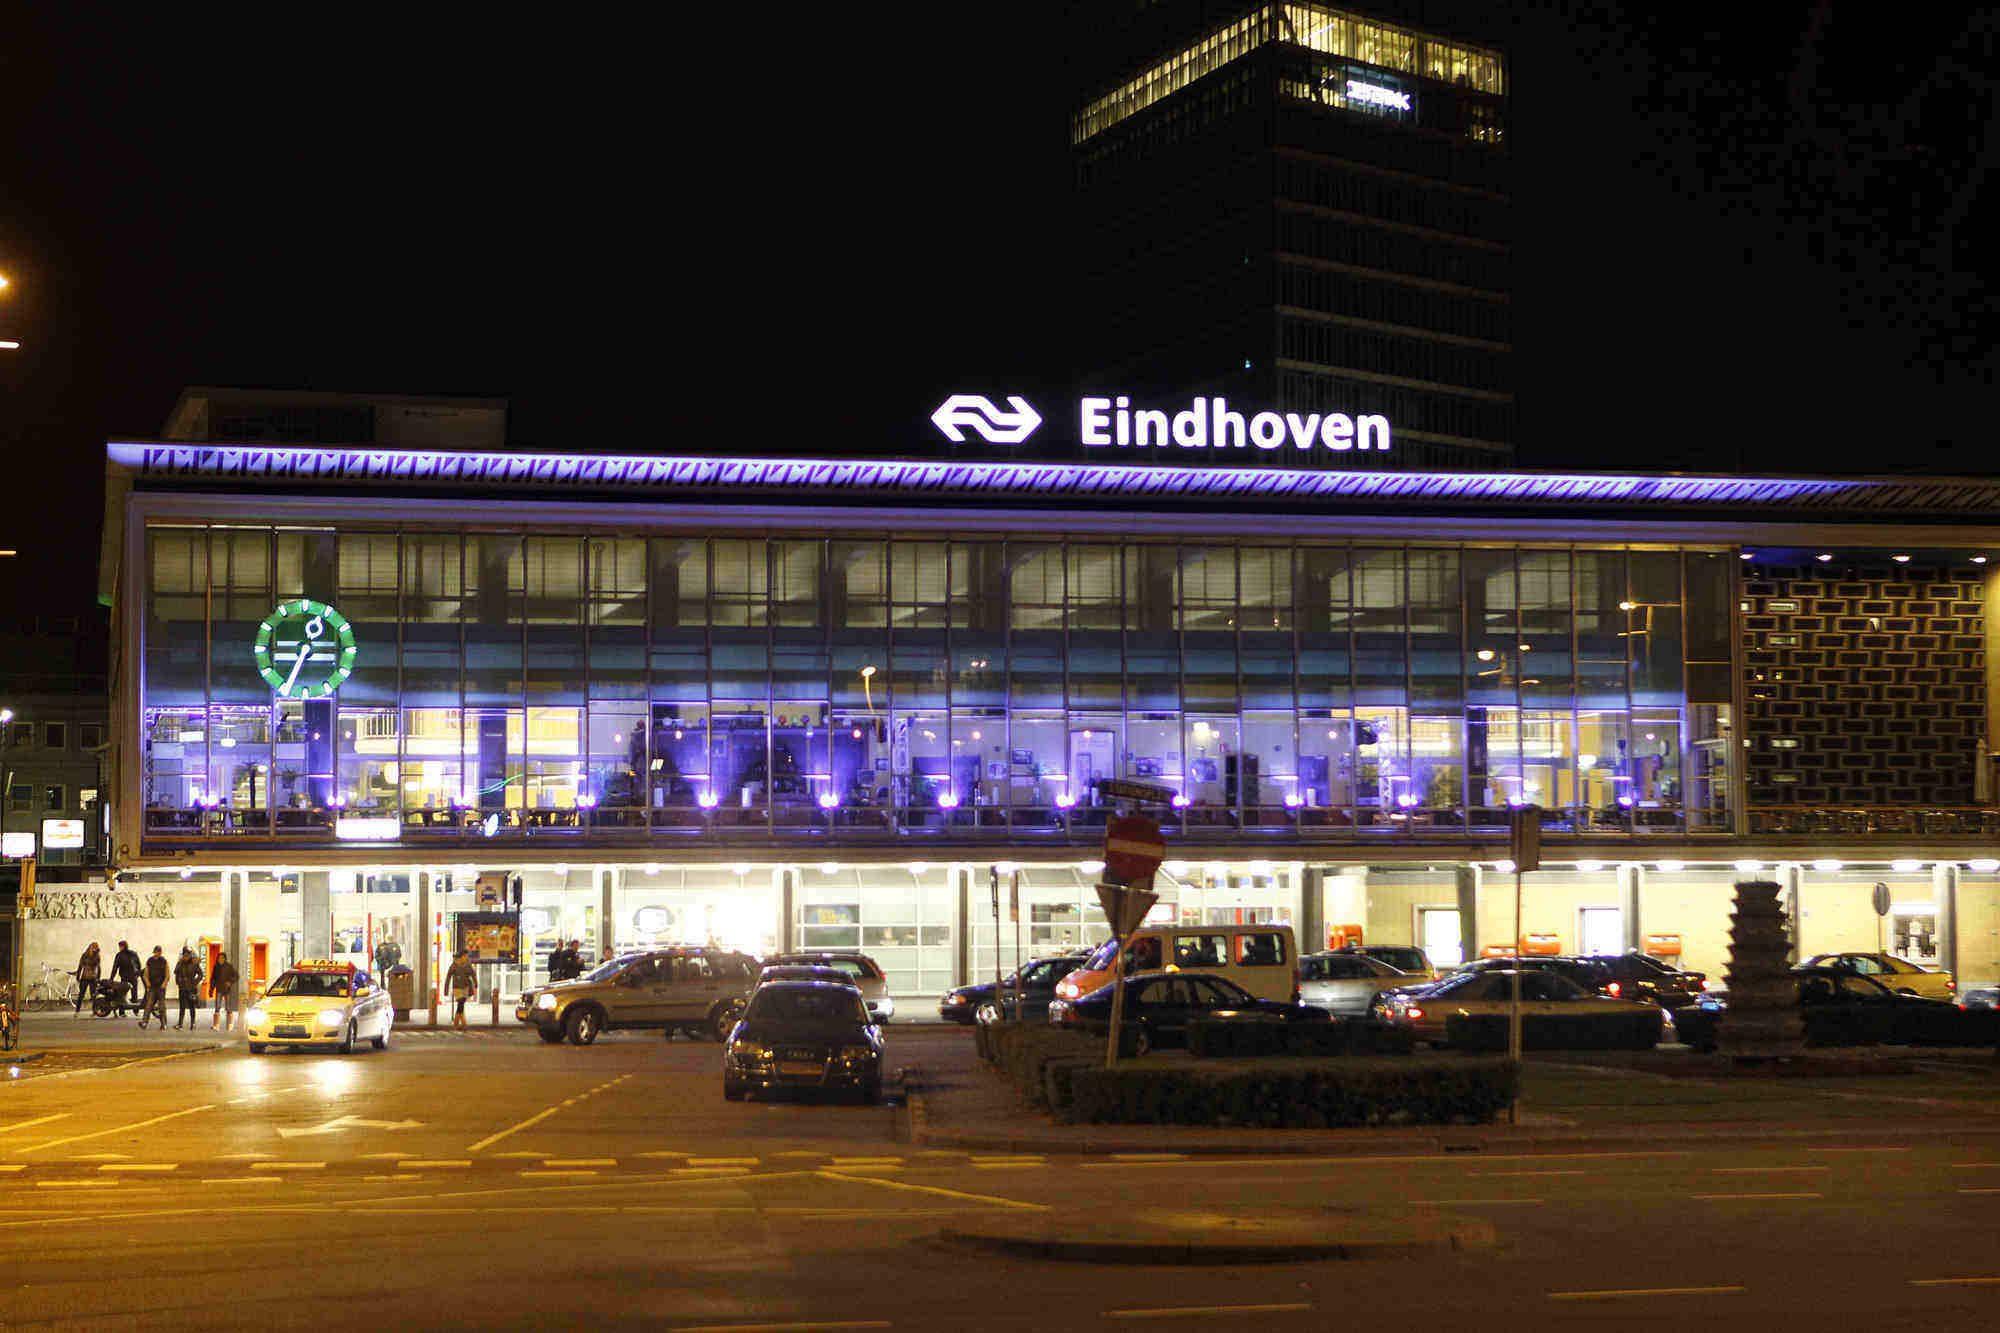 Eindhoven de gekste!